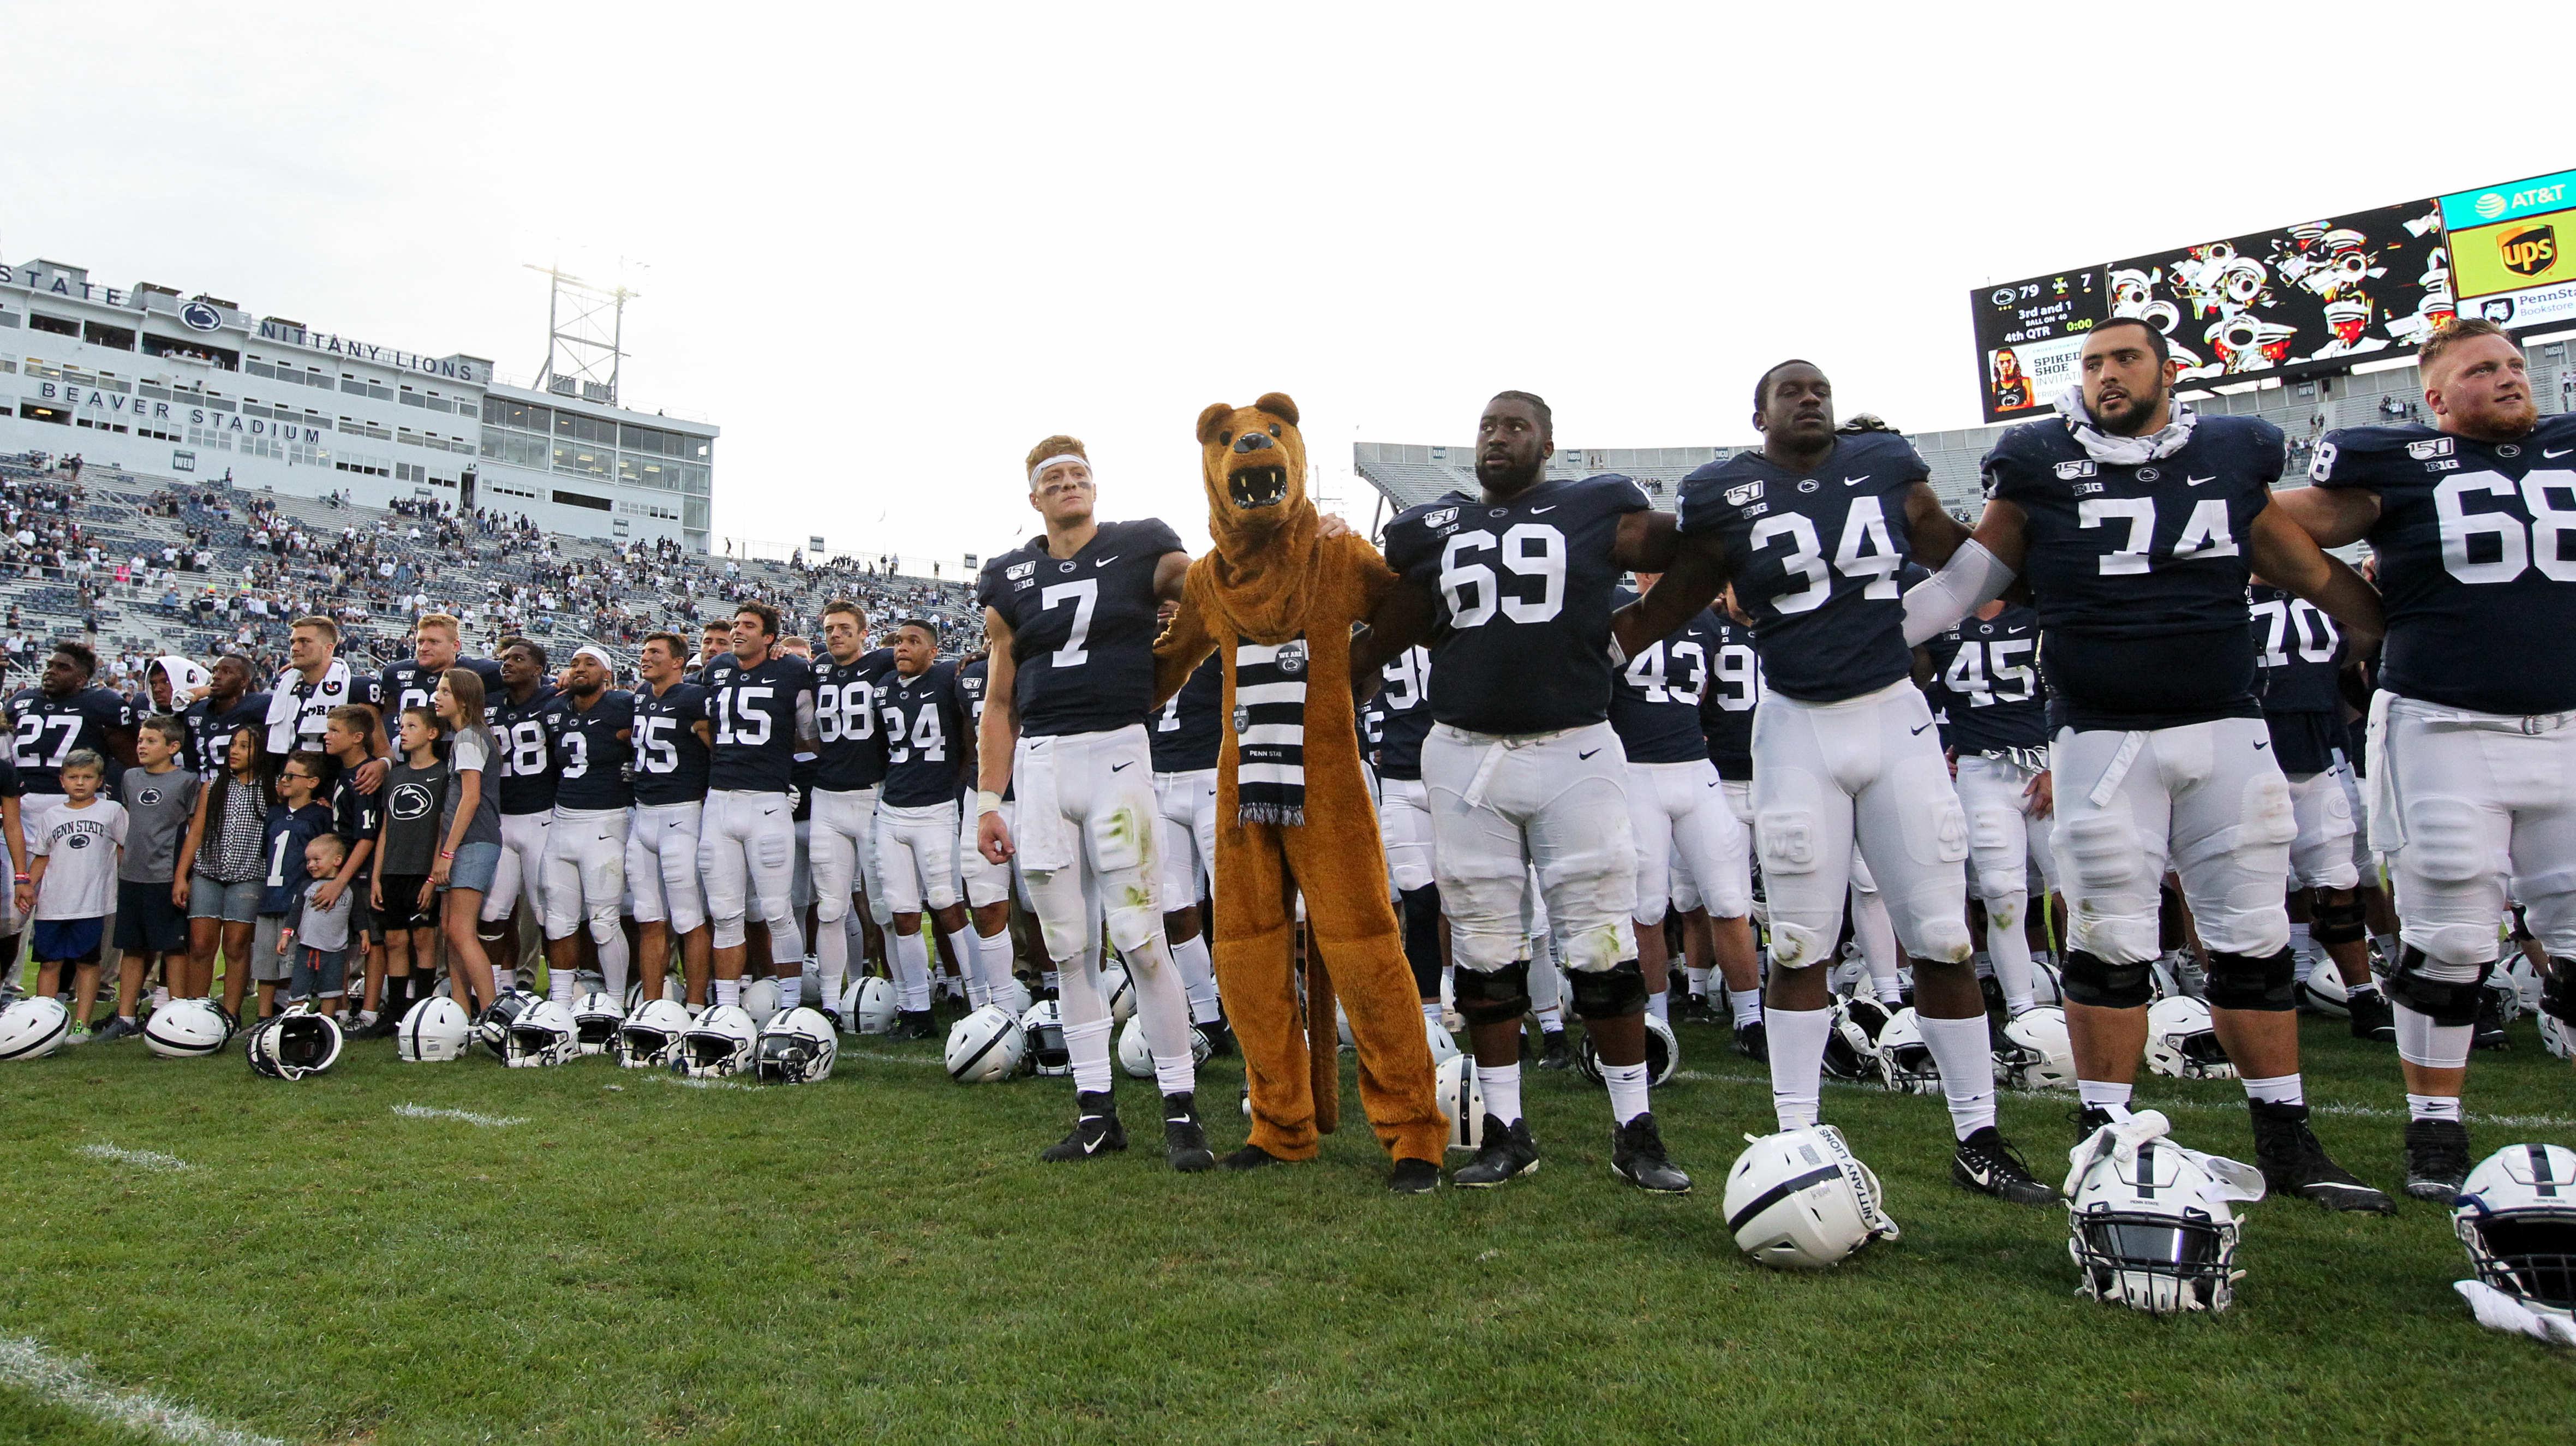 NCAA Football: Idaho at Penn State